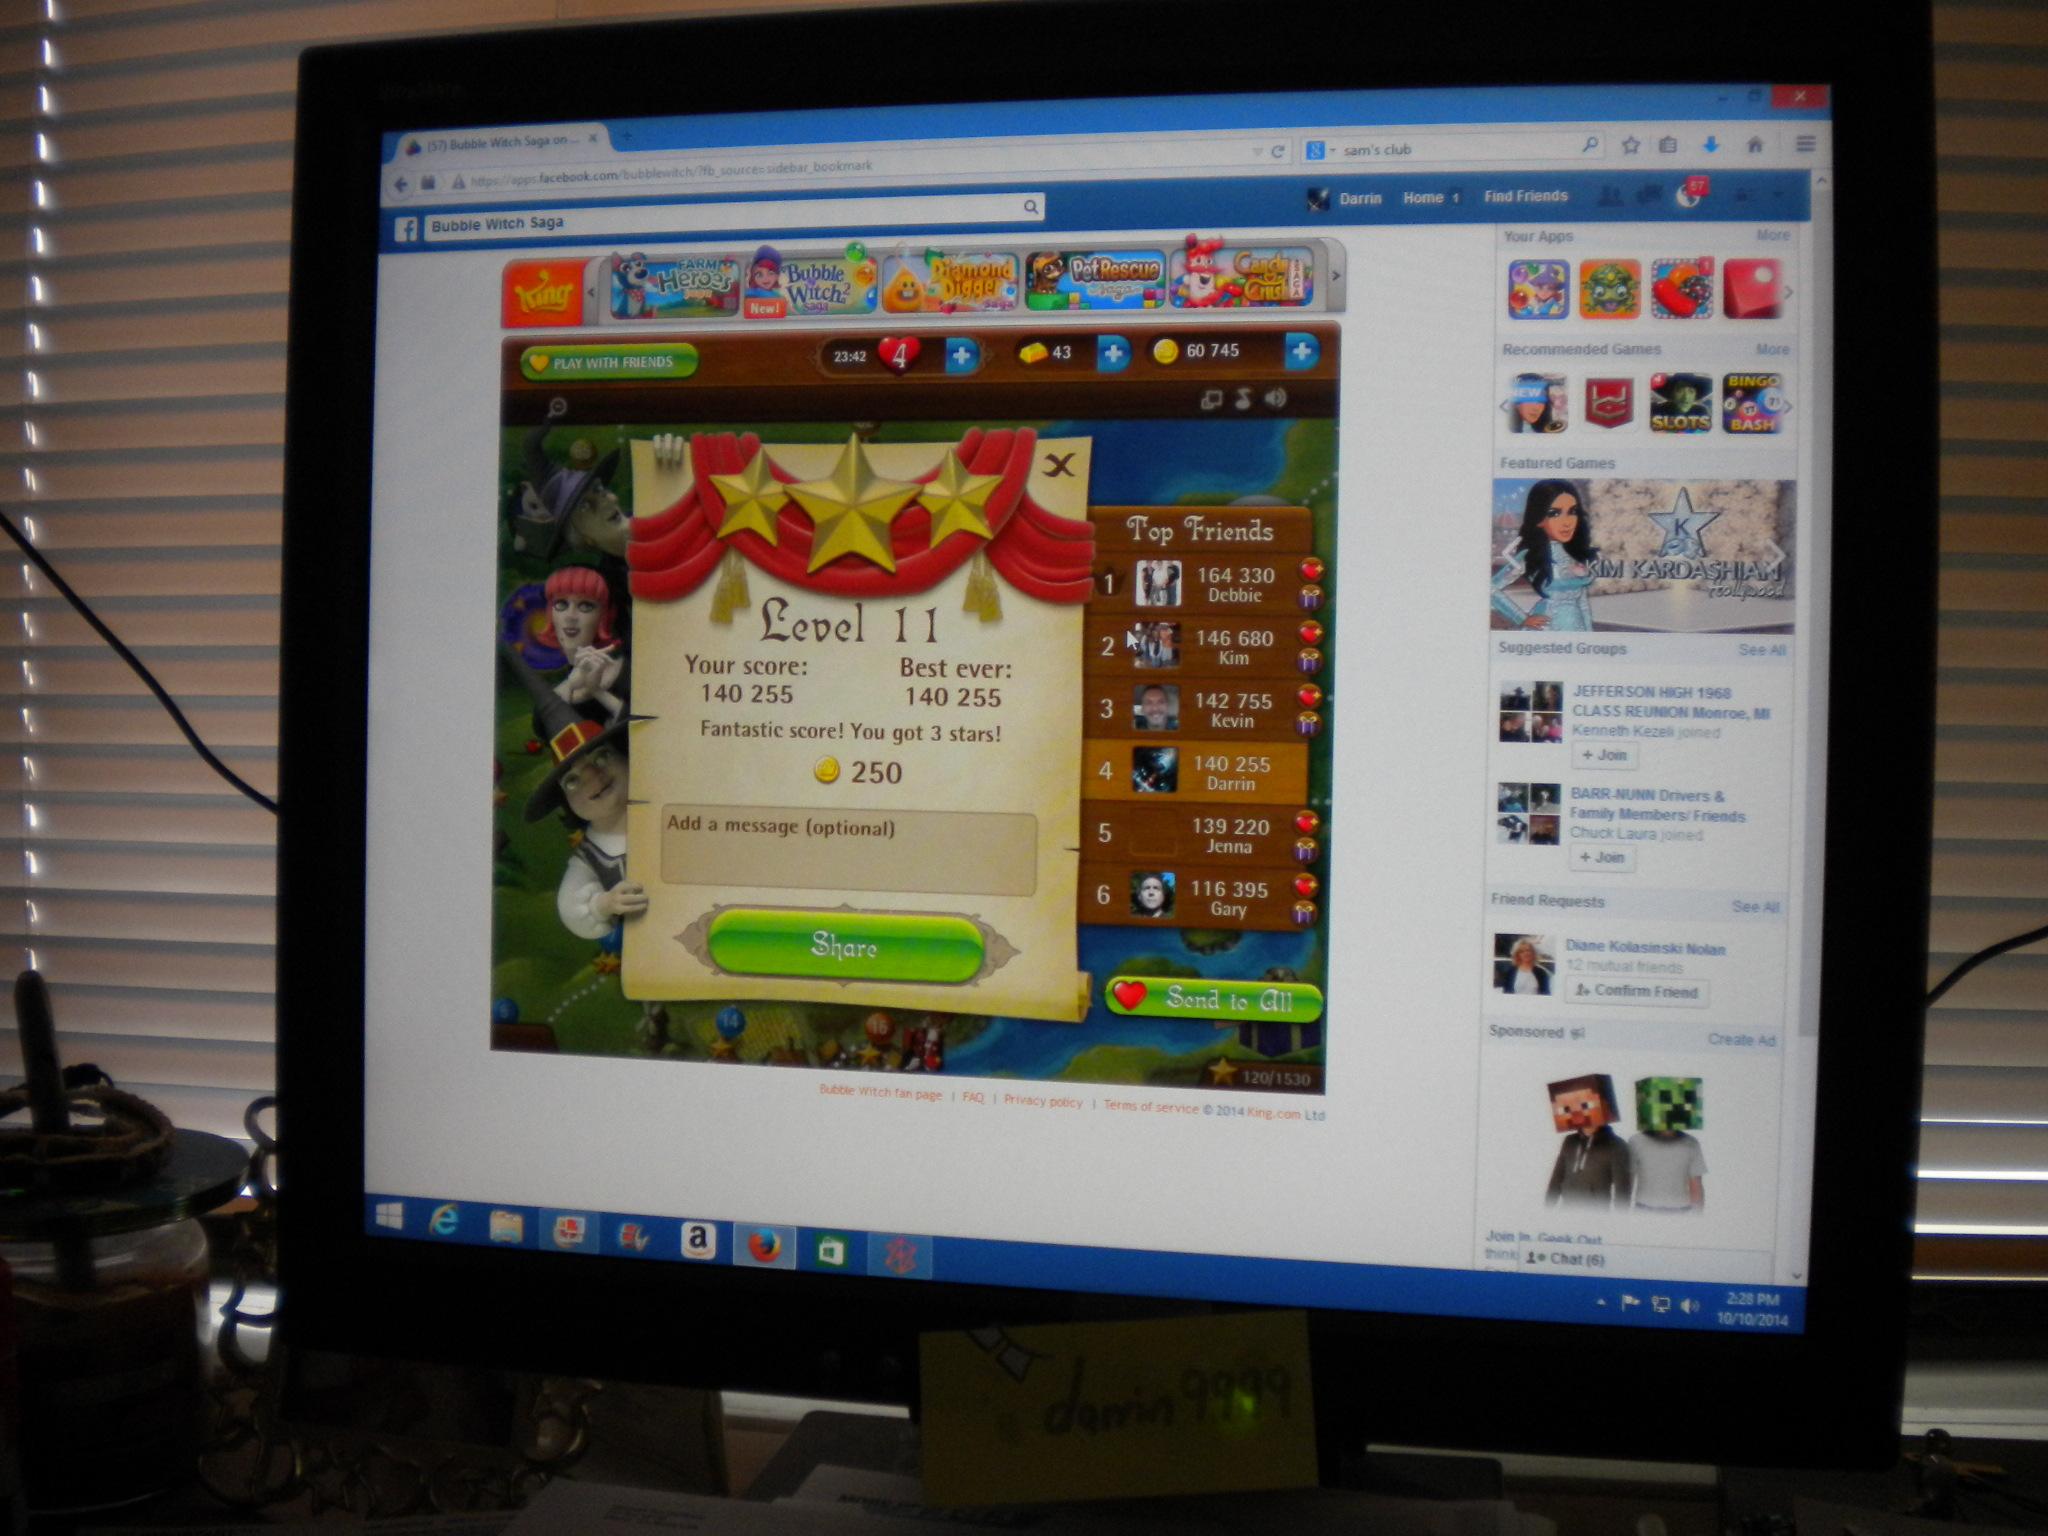 Bubble Witch Saga: Level 11 140,255 points